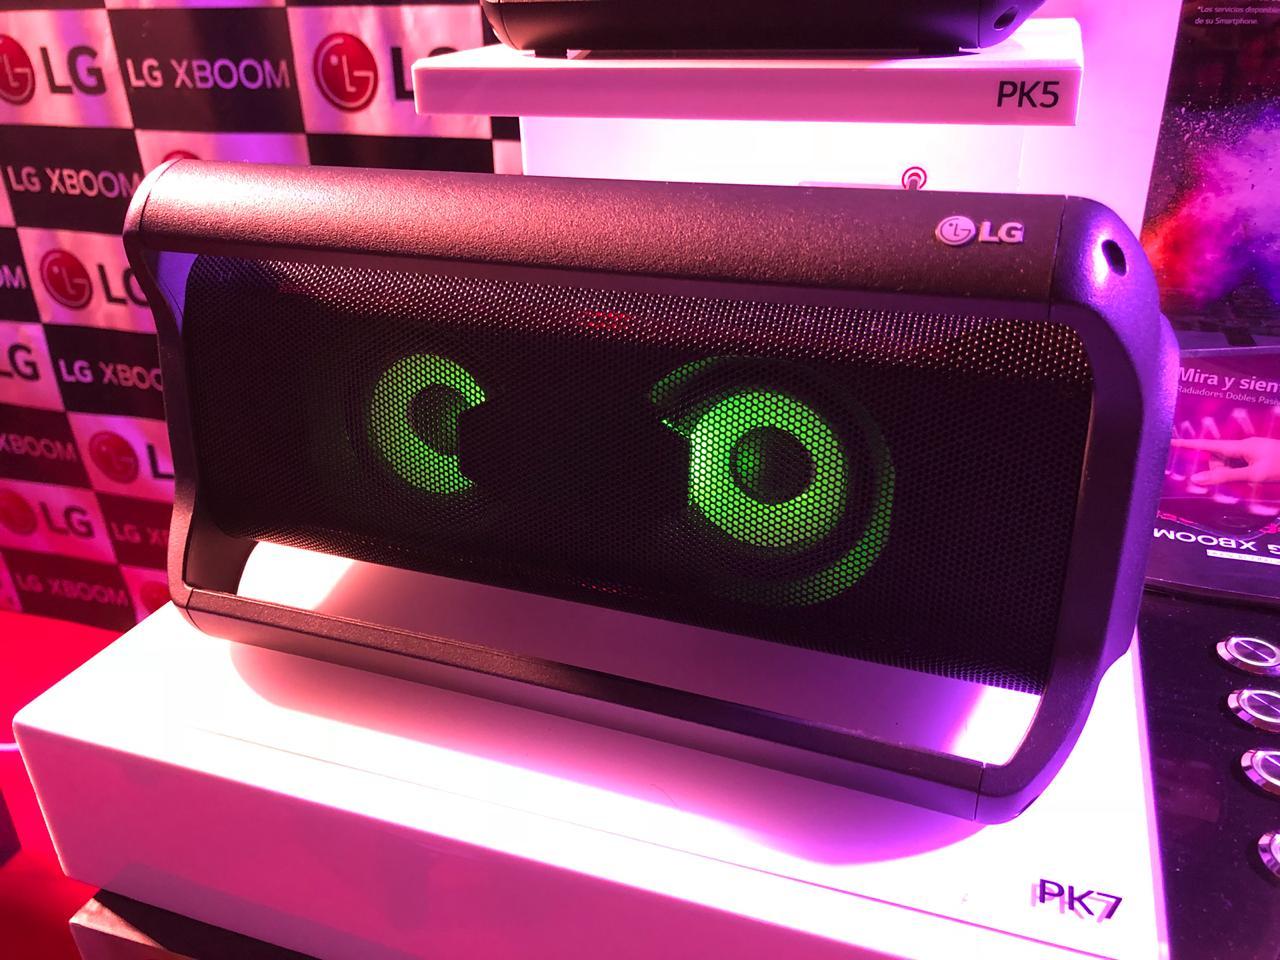 (+FOTOS) #Préndelo, línea de audio de LG Electronics llegóa Costa Rica